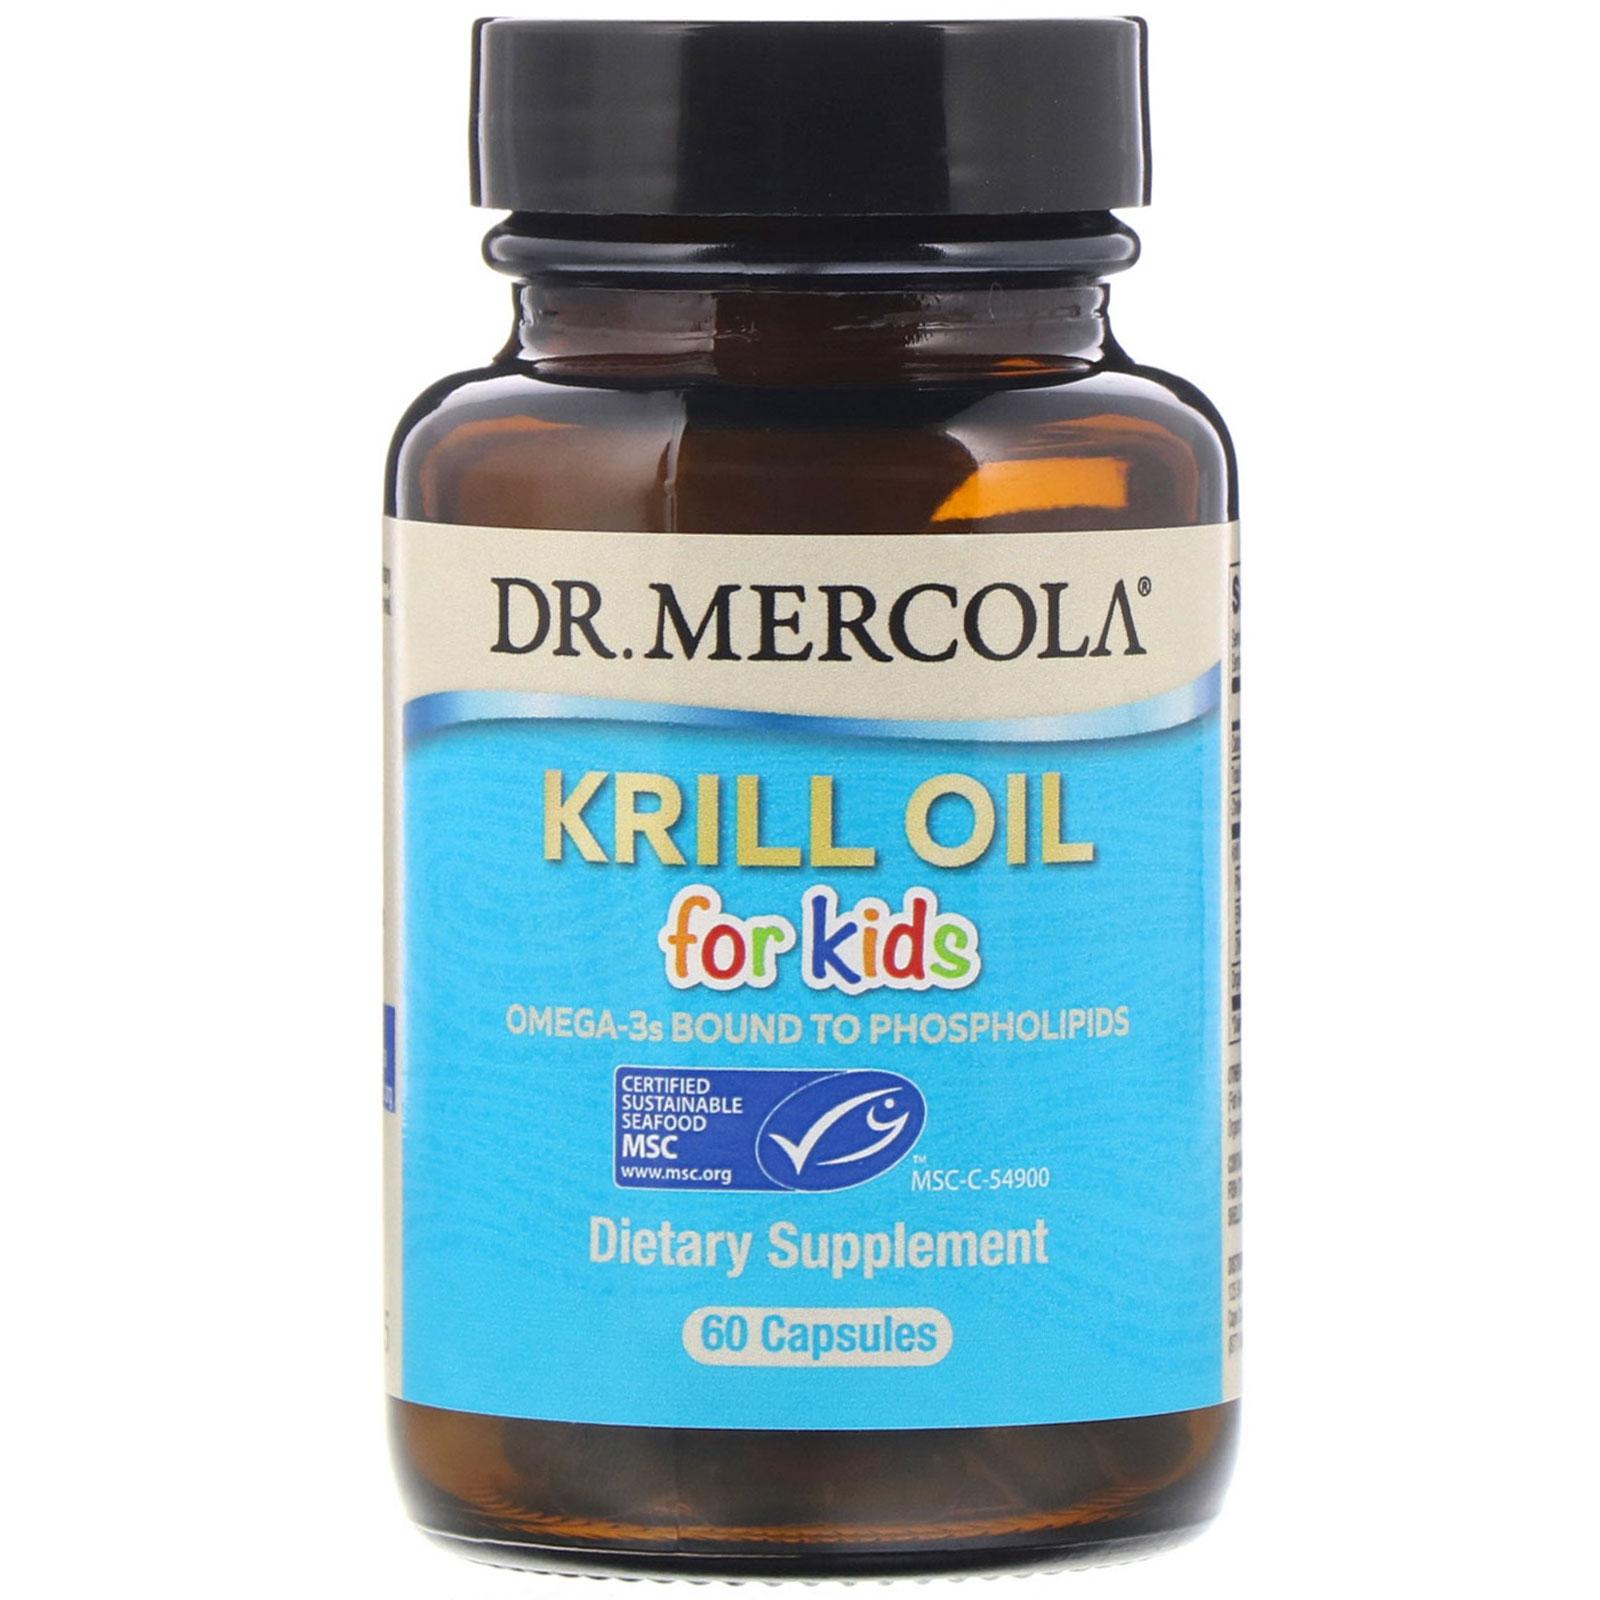 Image of Dr. Mercola, Kids' Krill Oil, 60 Licaps Capsules 0813006011495